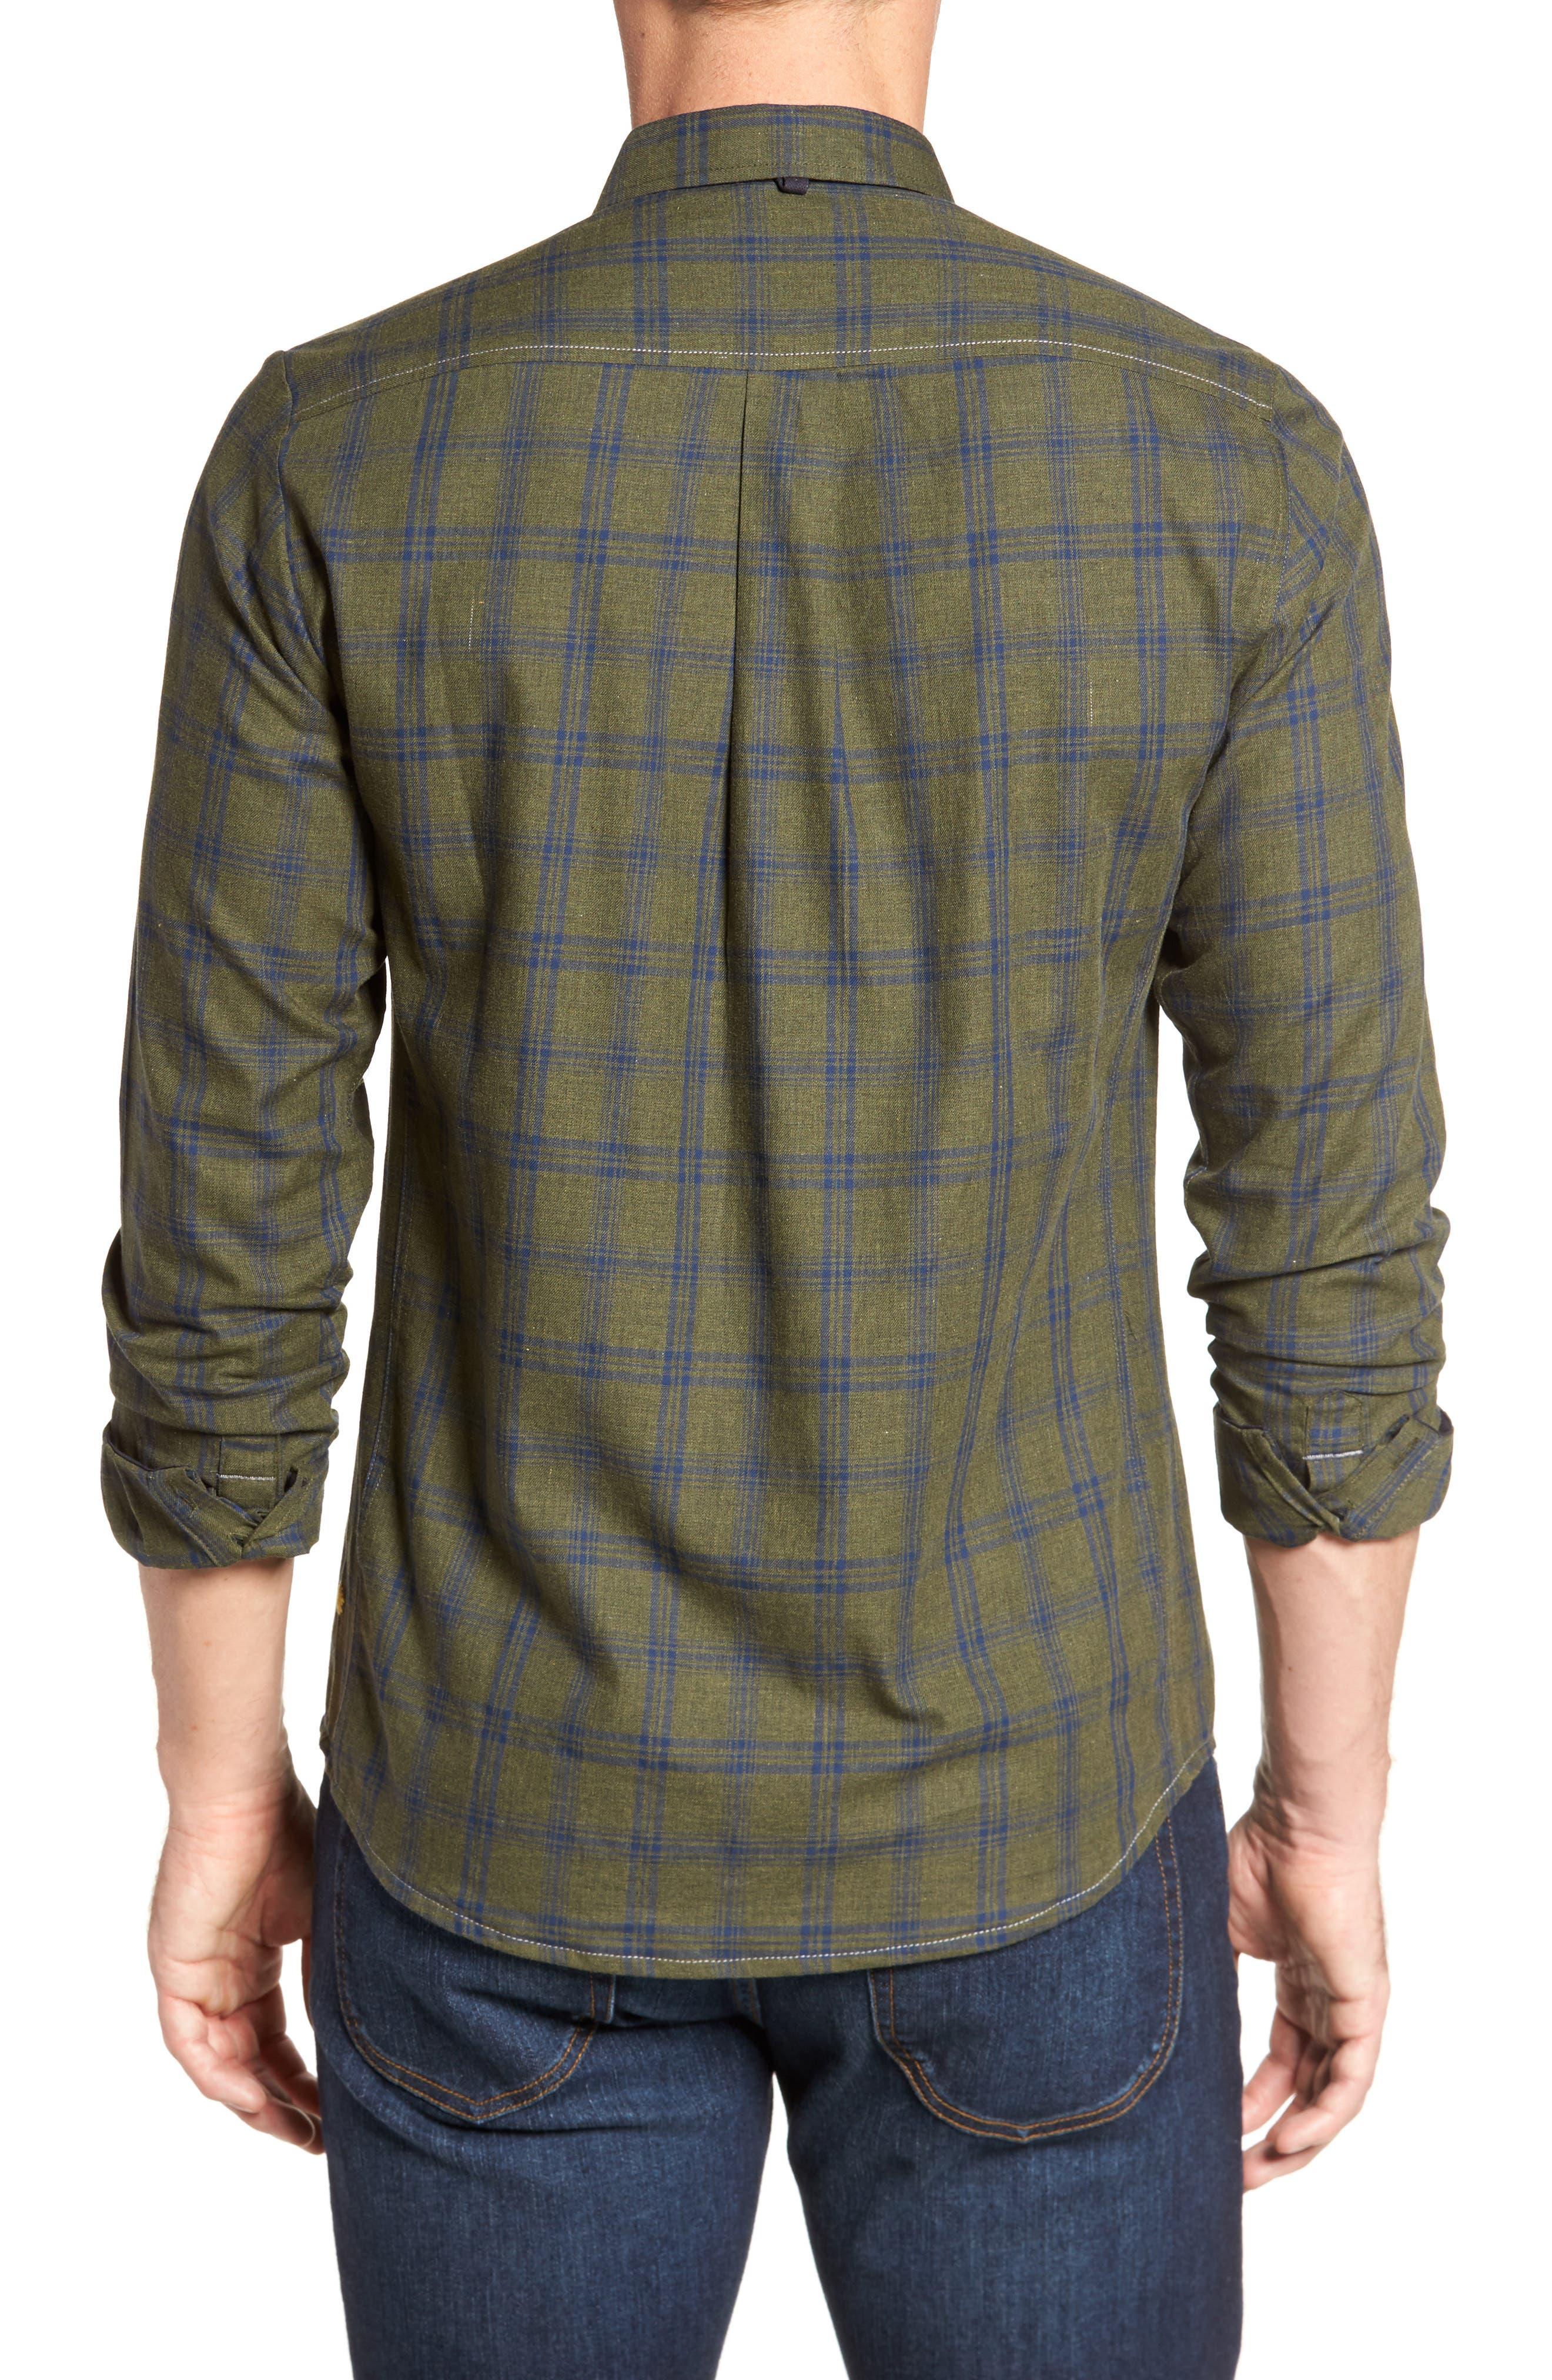 Alternate Image 2  - Descendant of Thieves Vintage Army Plaid Sport Shirt